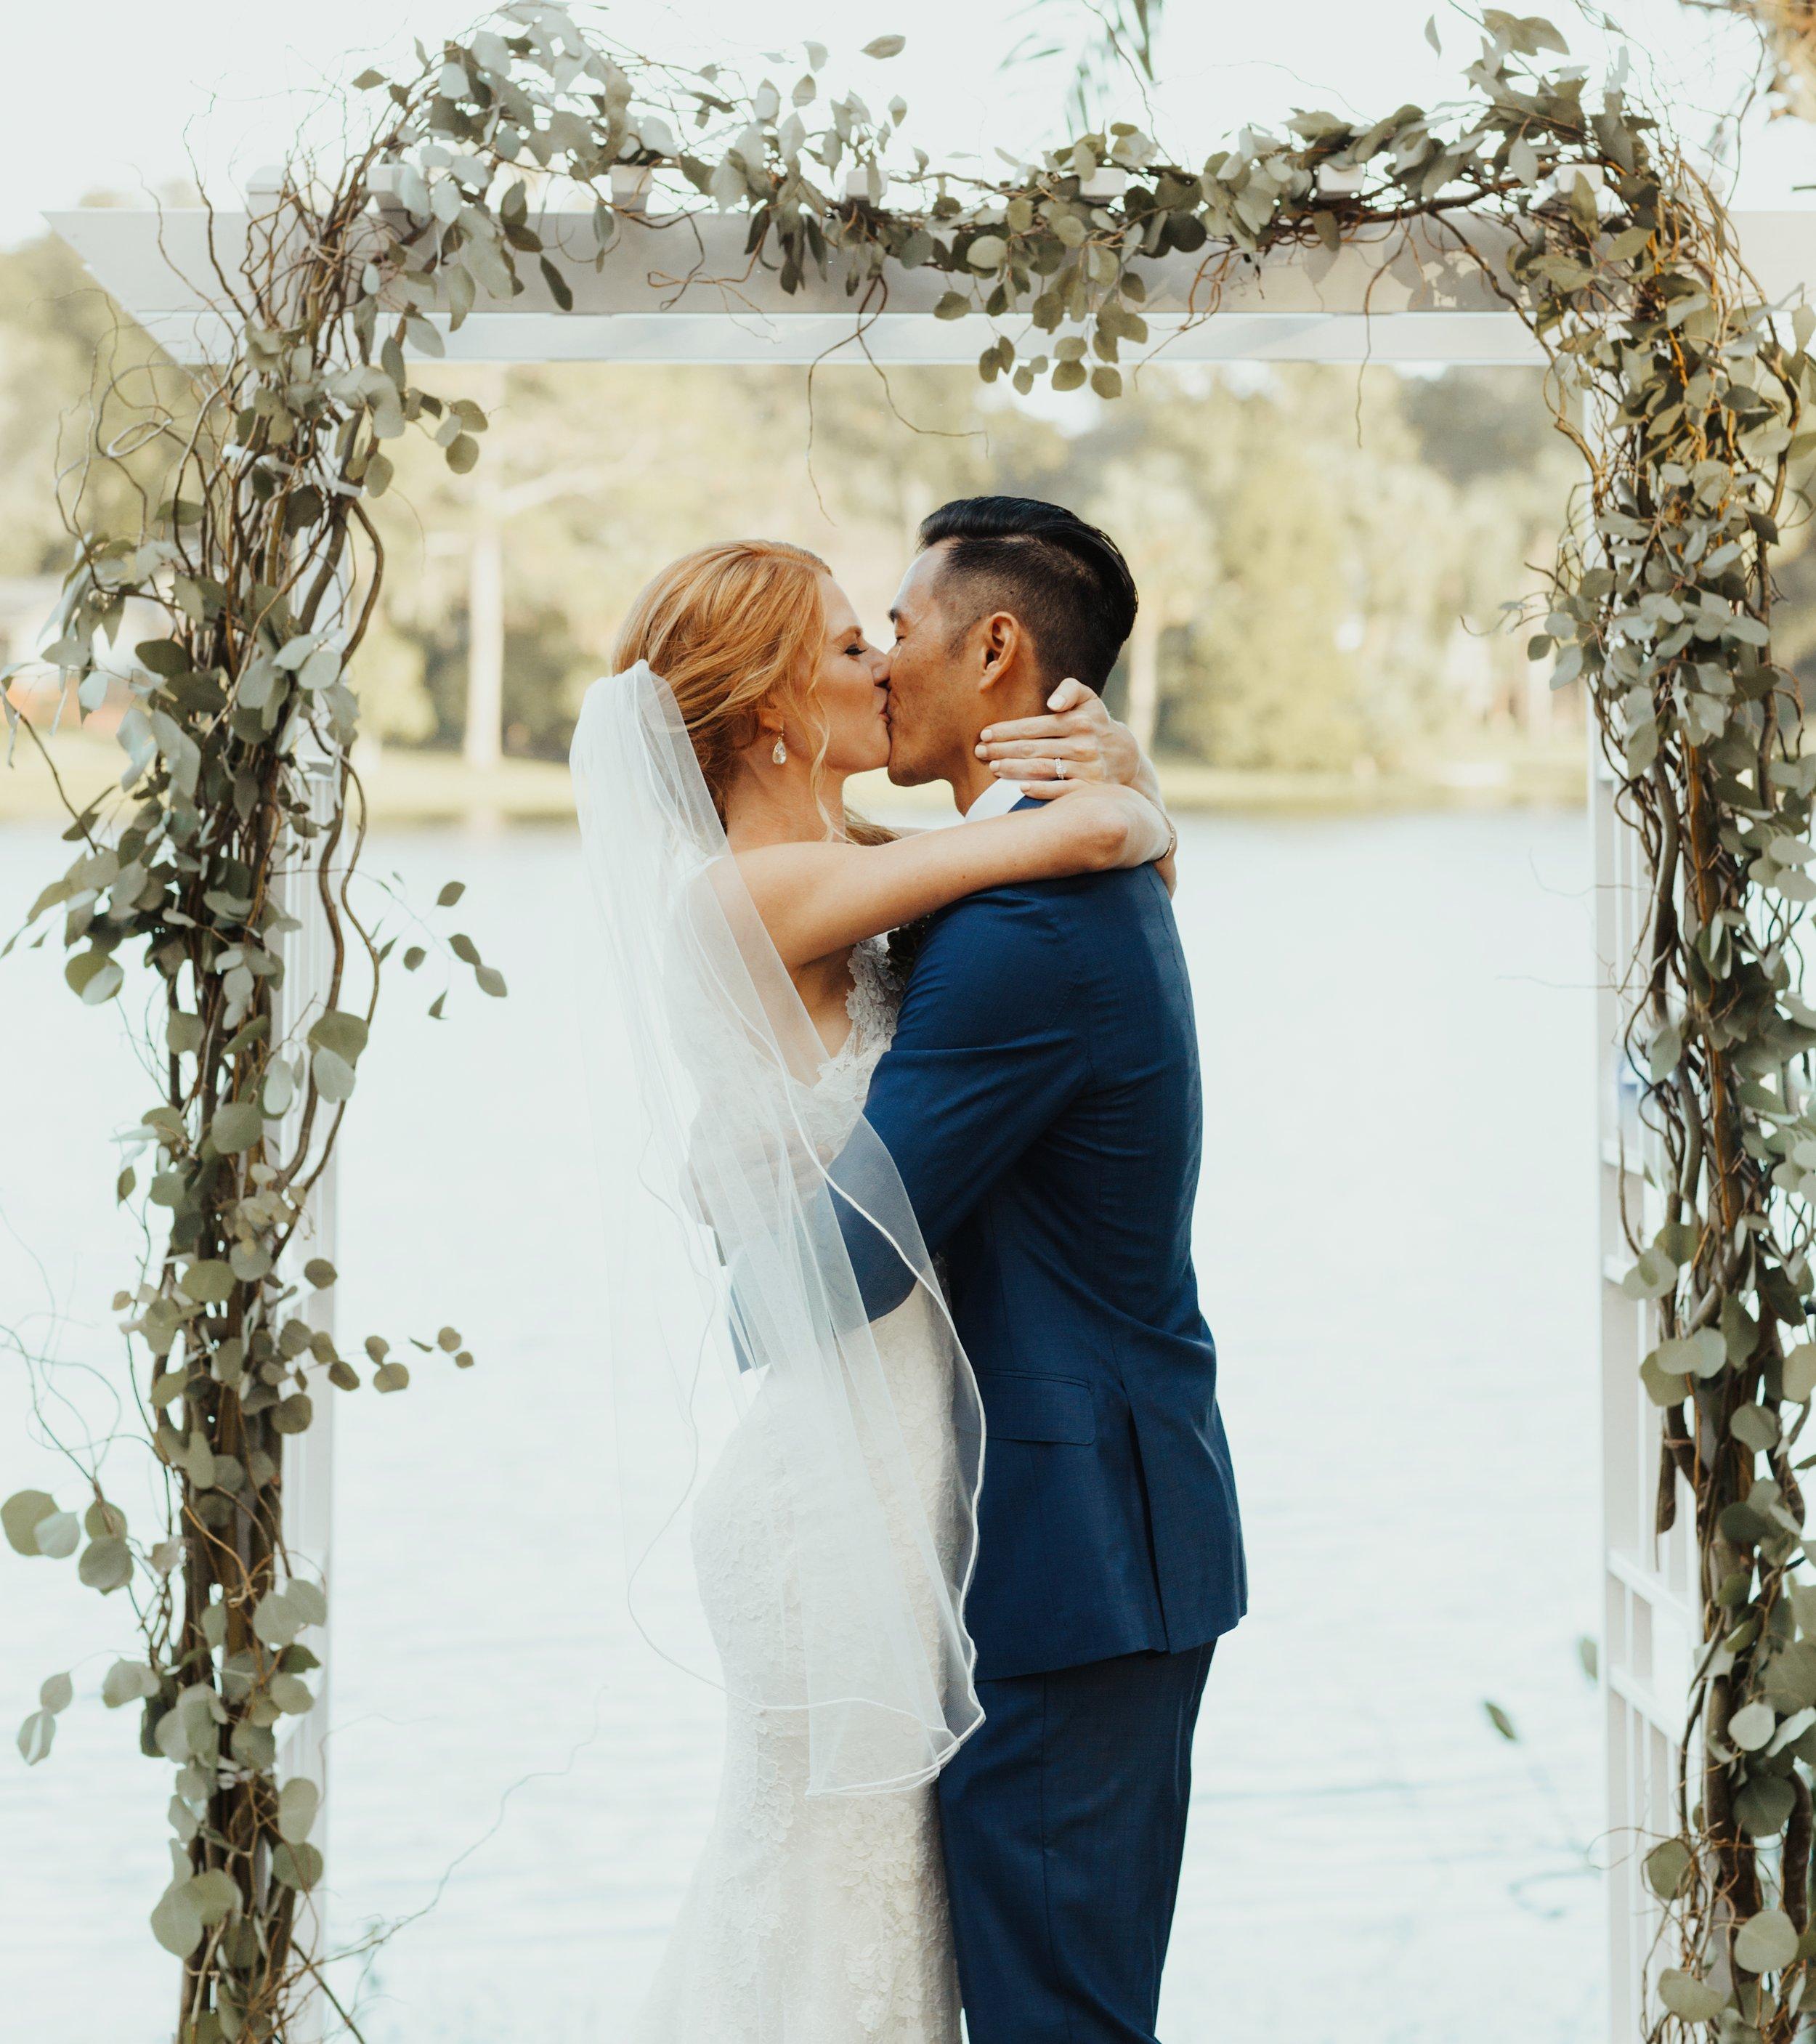 Wedding Day | Vanessa Boy | vanessaboy.com-692.com .jpg